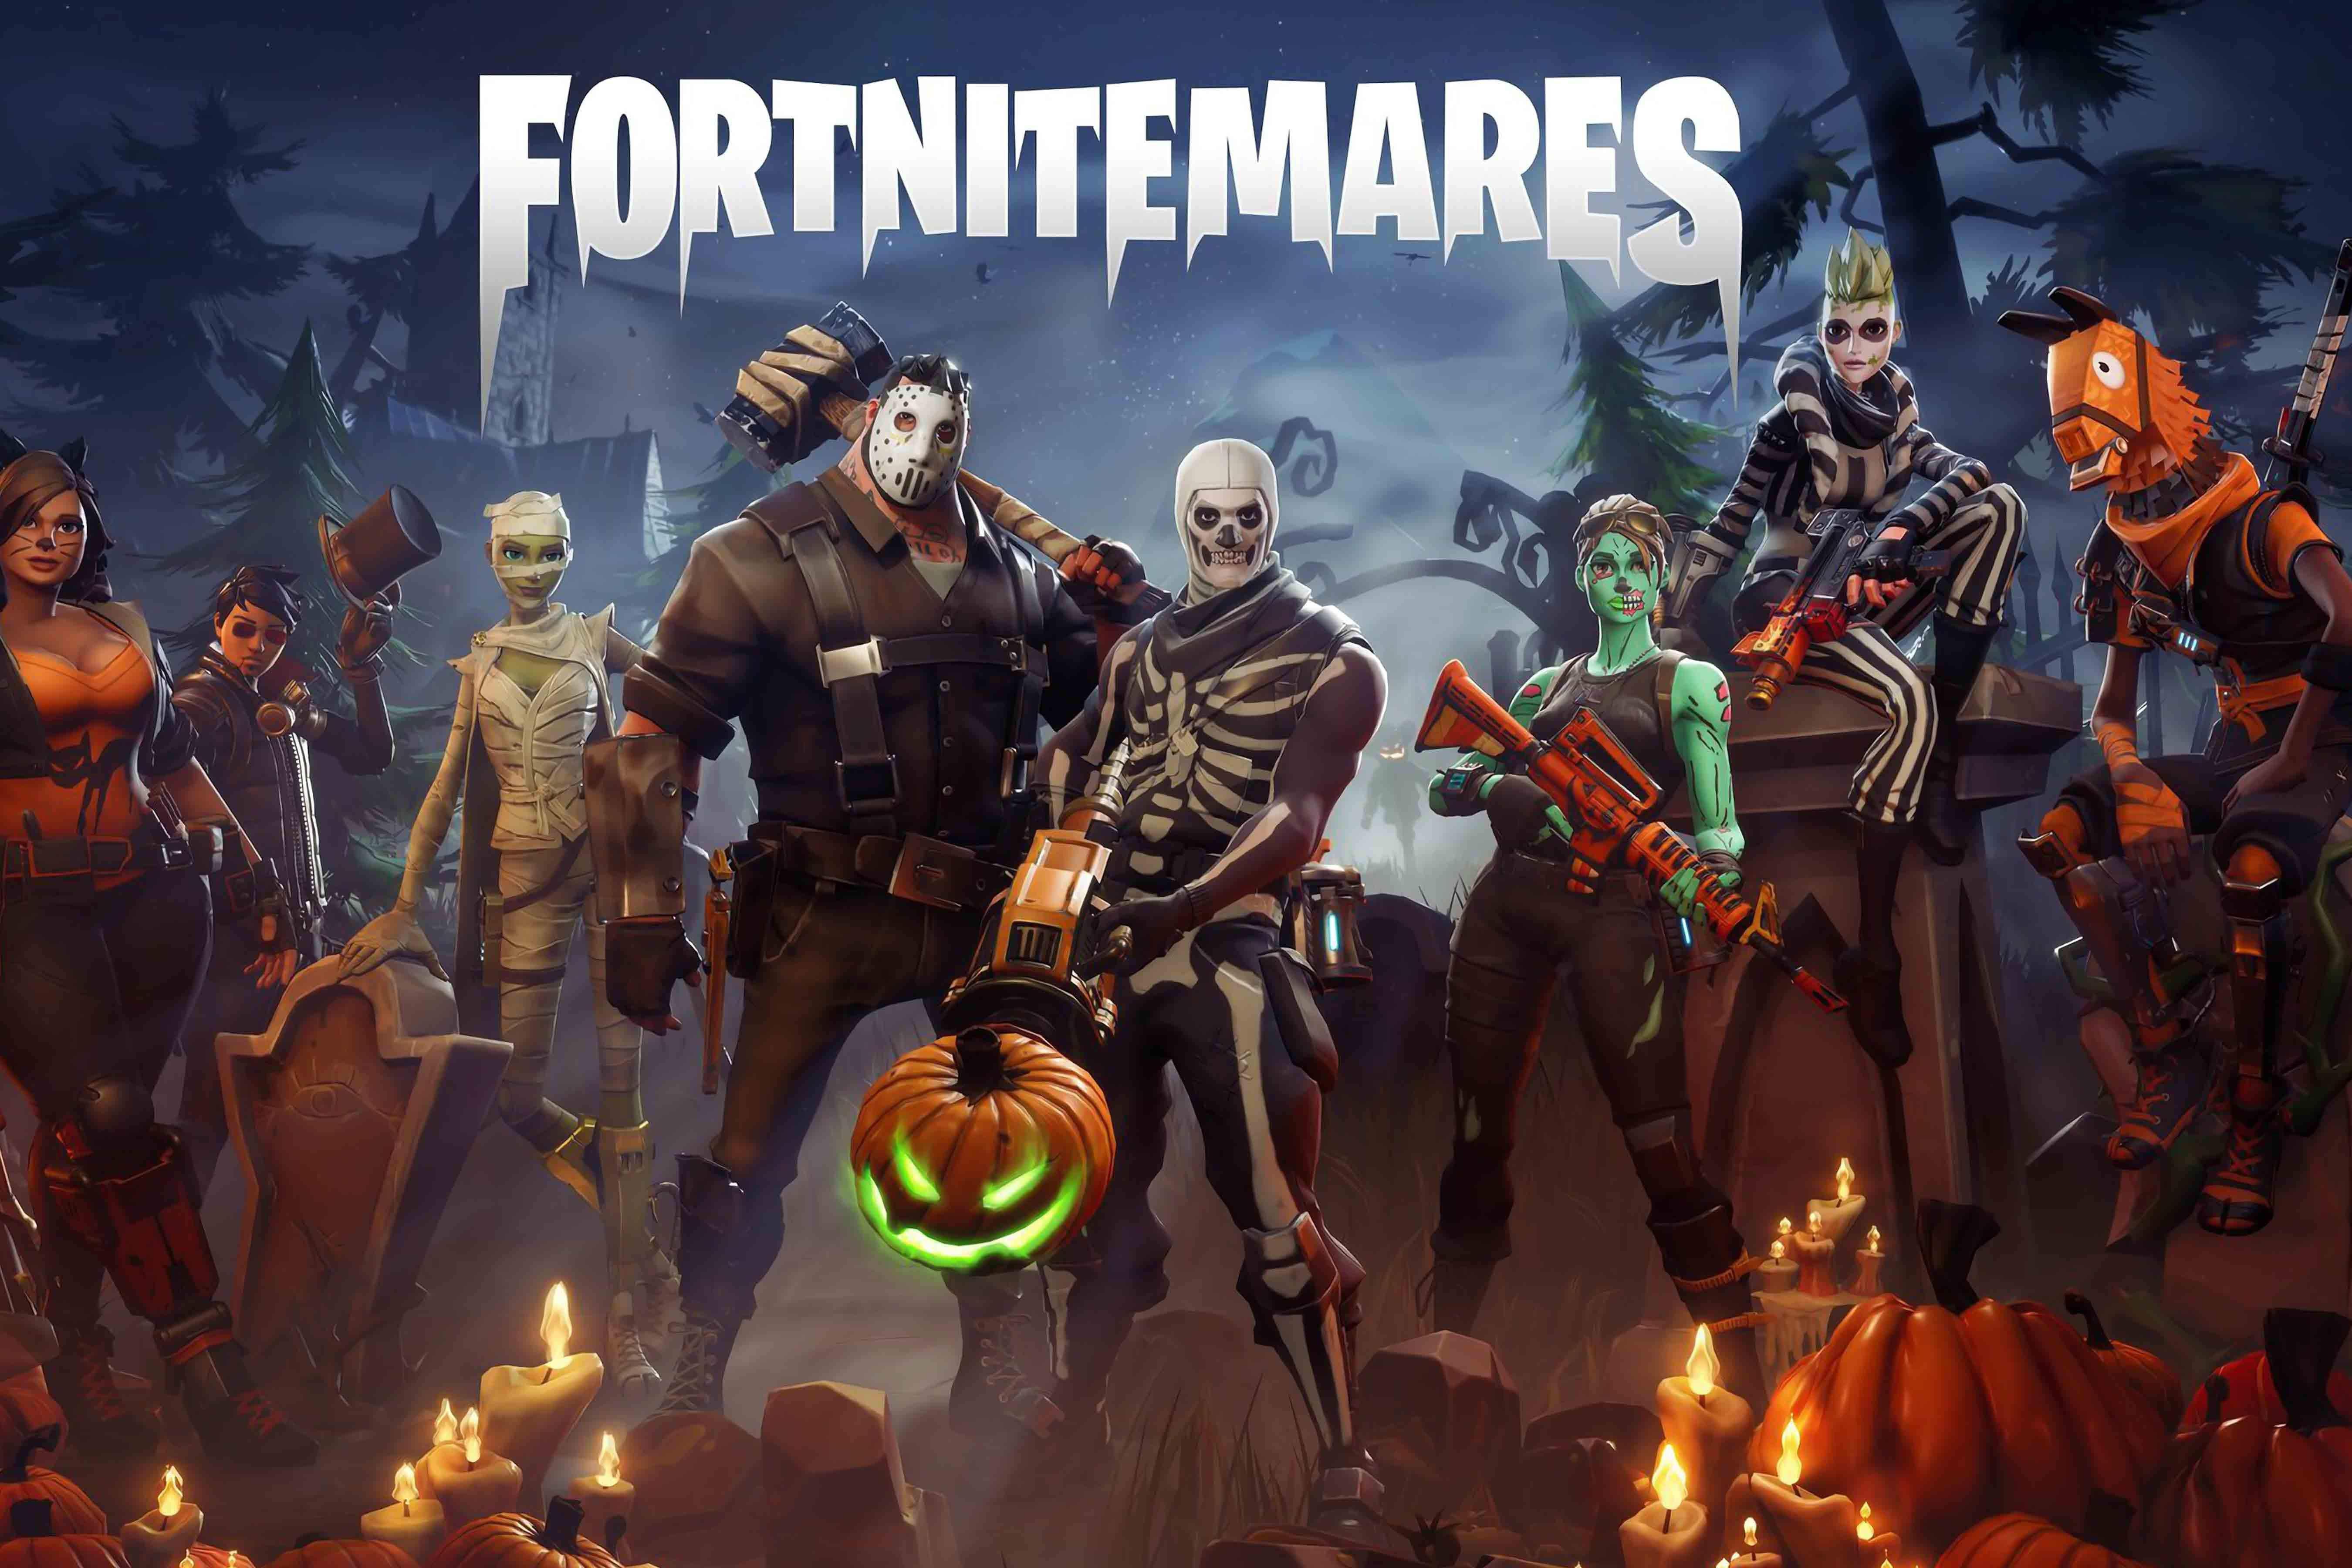 Fortnitemares Wallpapers 5400x3600